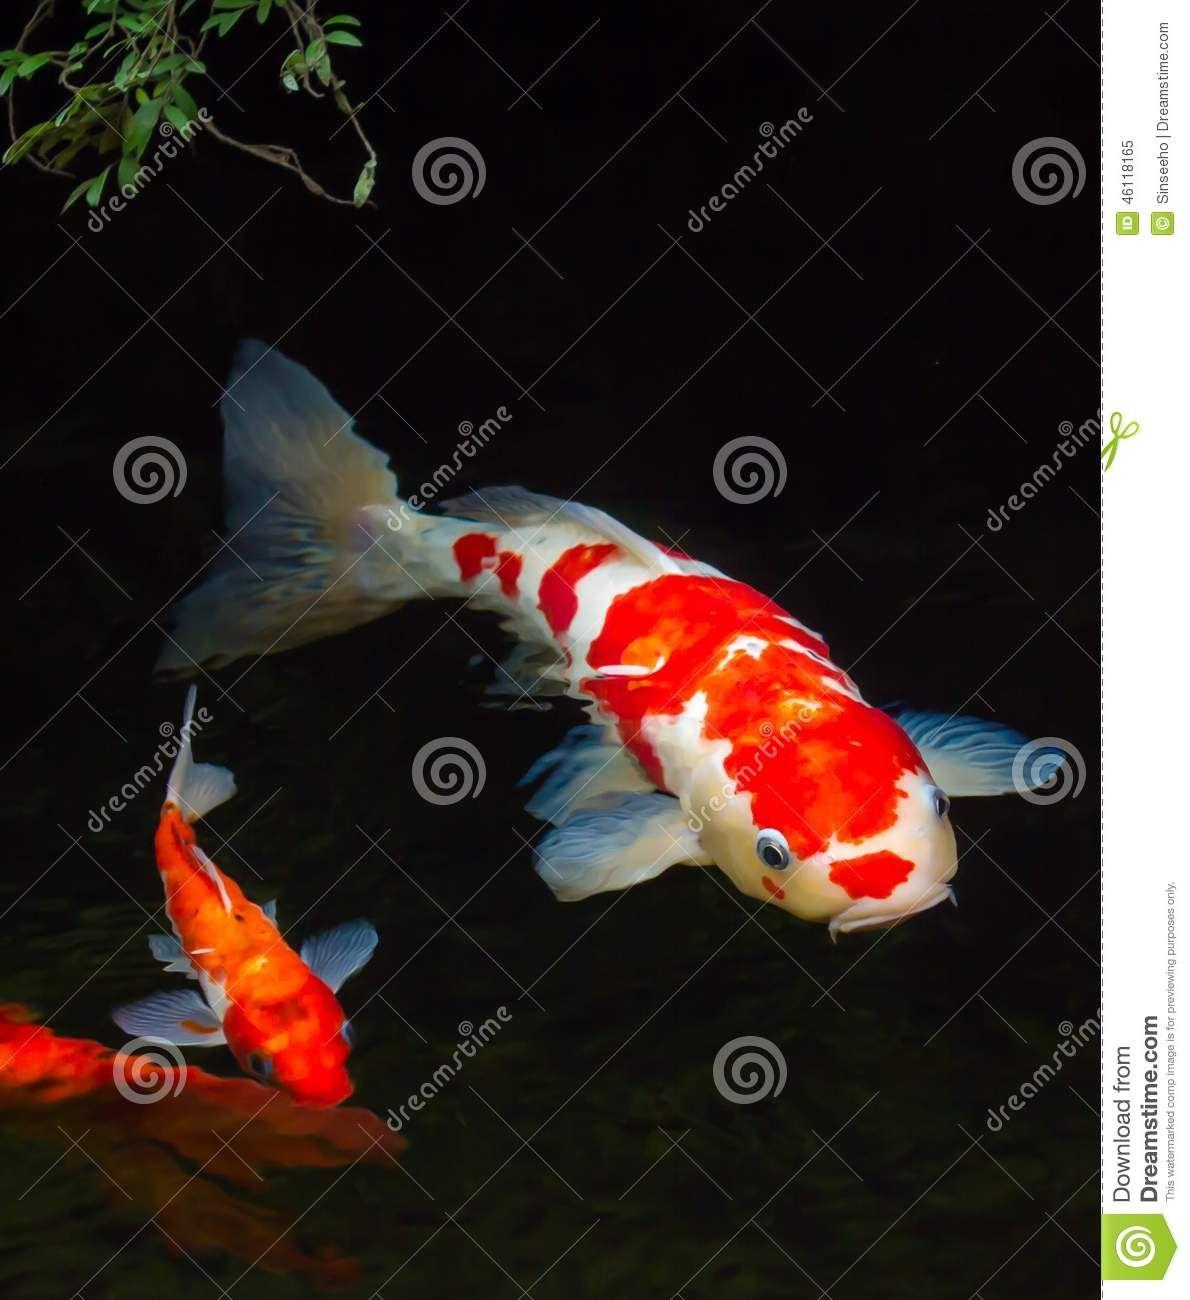 Koi fish stock image. Image of fortune, color, swimming - 46118165 ...